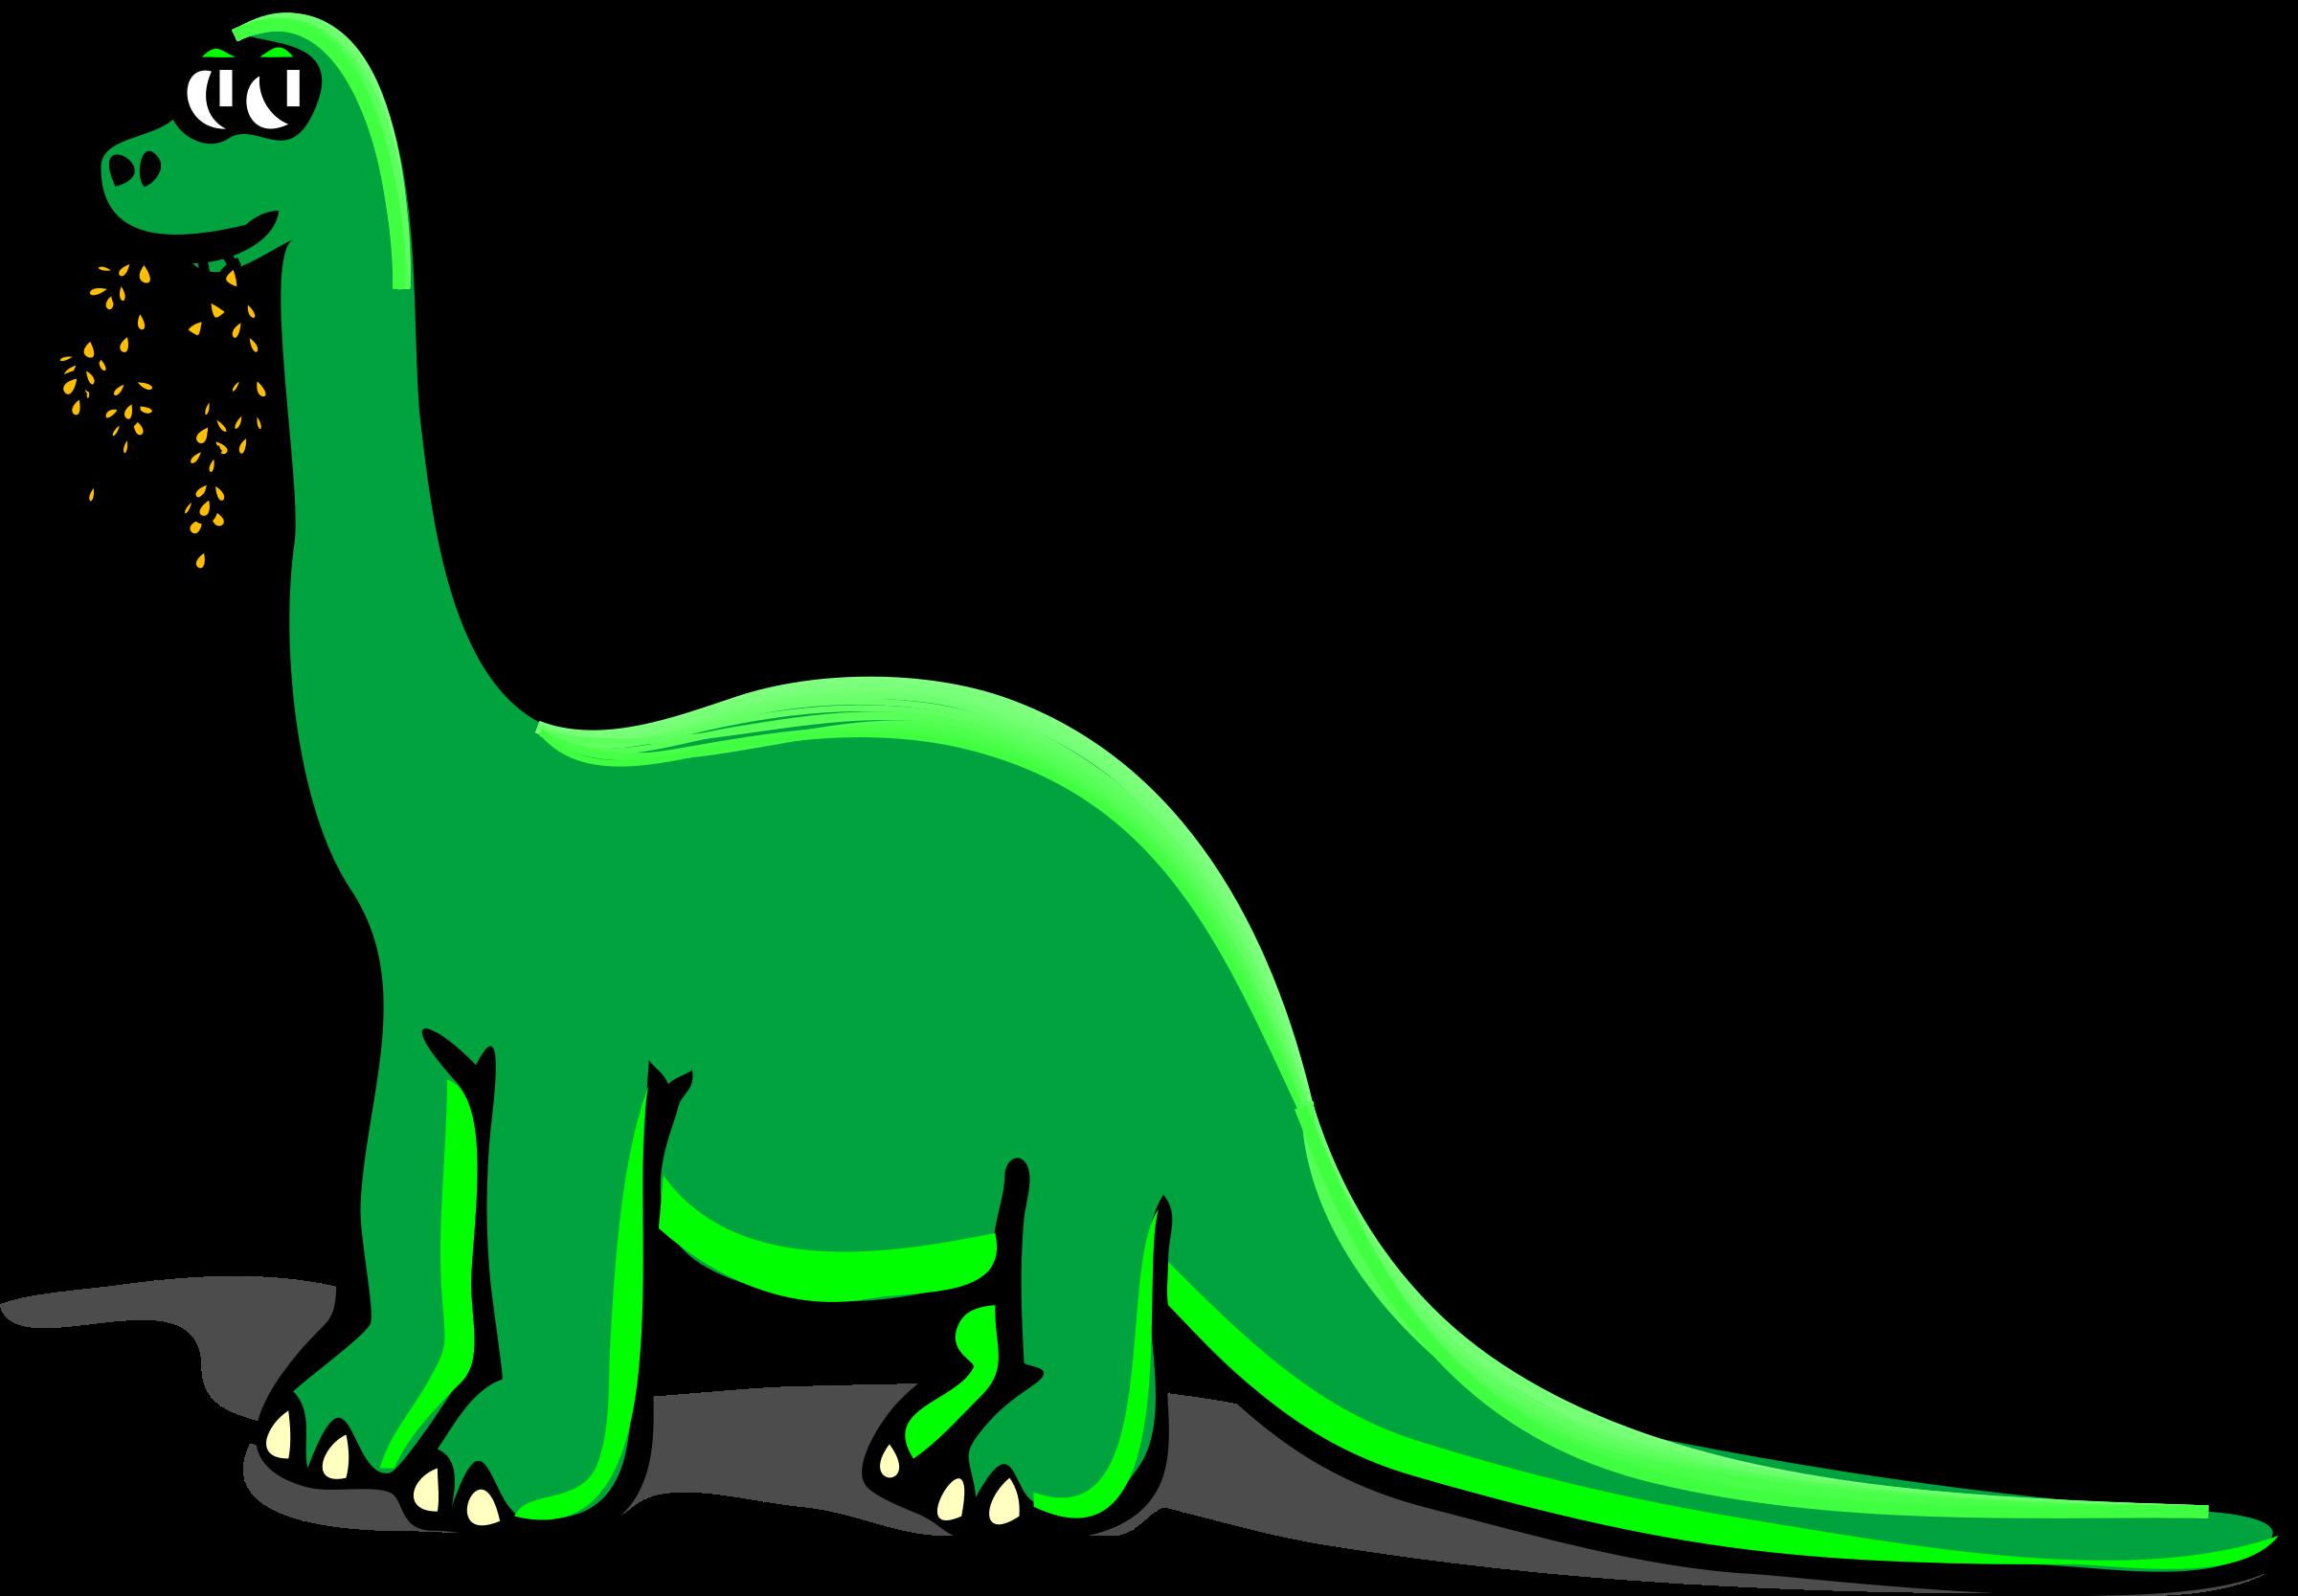 2400x1667 Dinosaur Clip Art Black And White